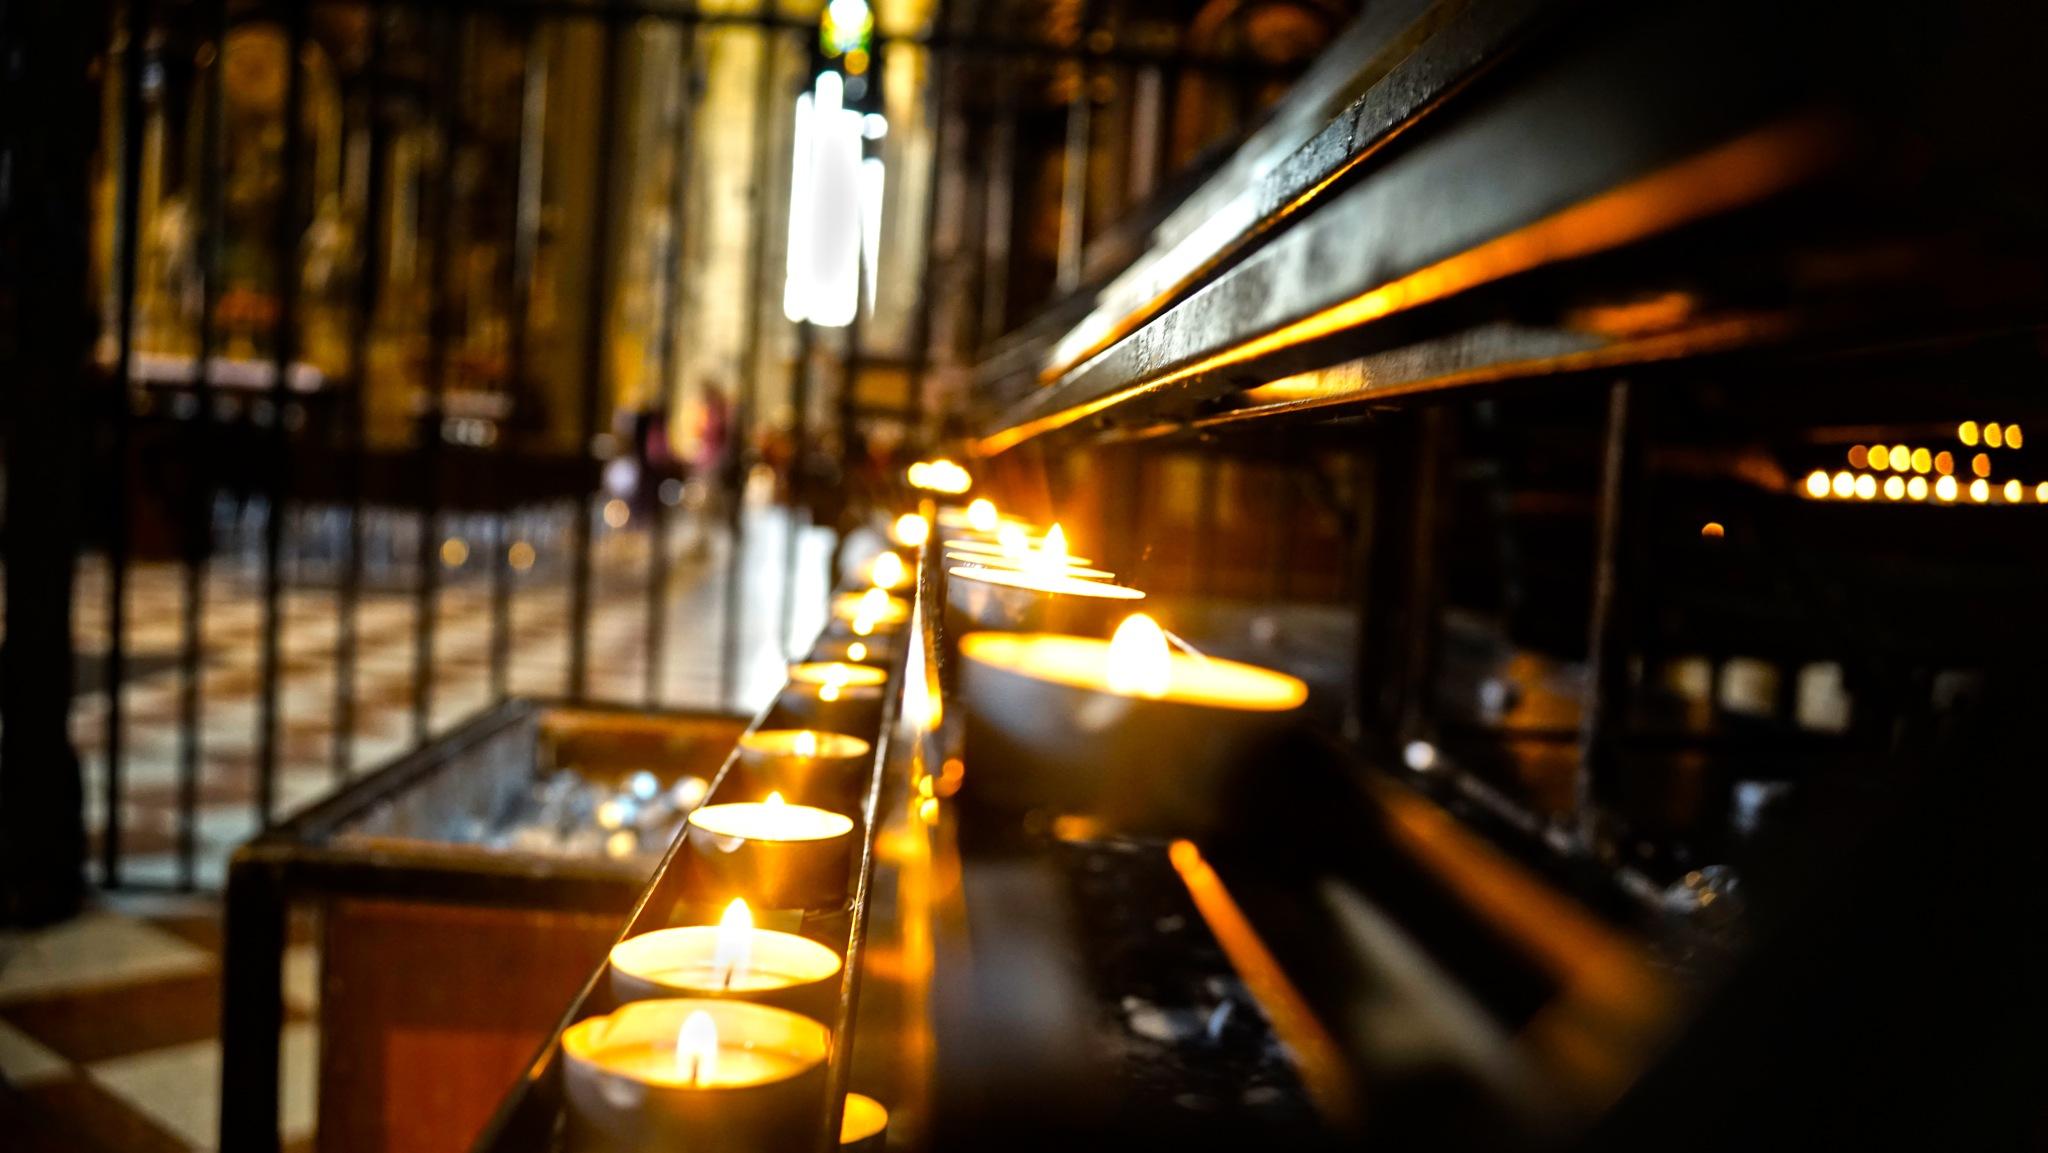 Church Candles by Blackhawk